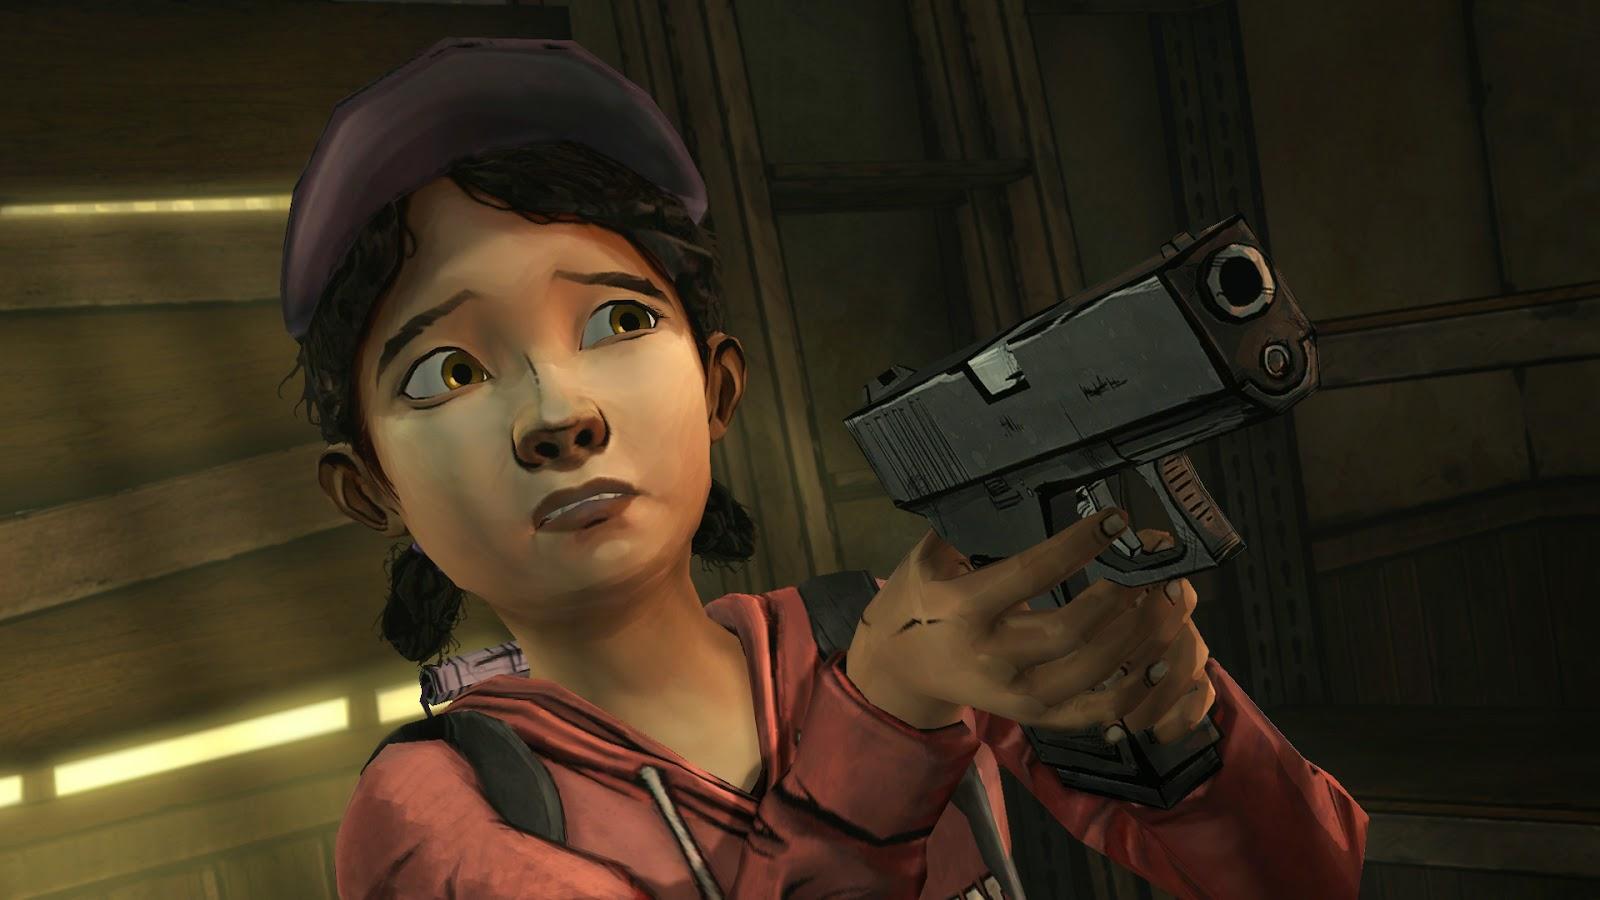 3D hentai   clementine   walking dead 2) Clementine - The Walking Dead